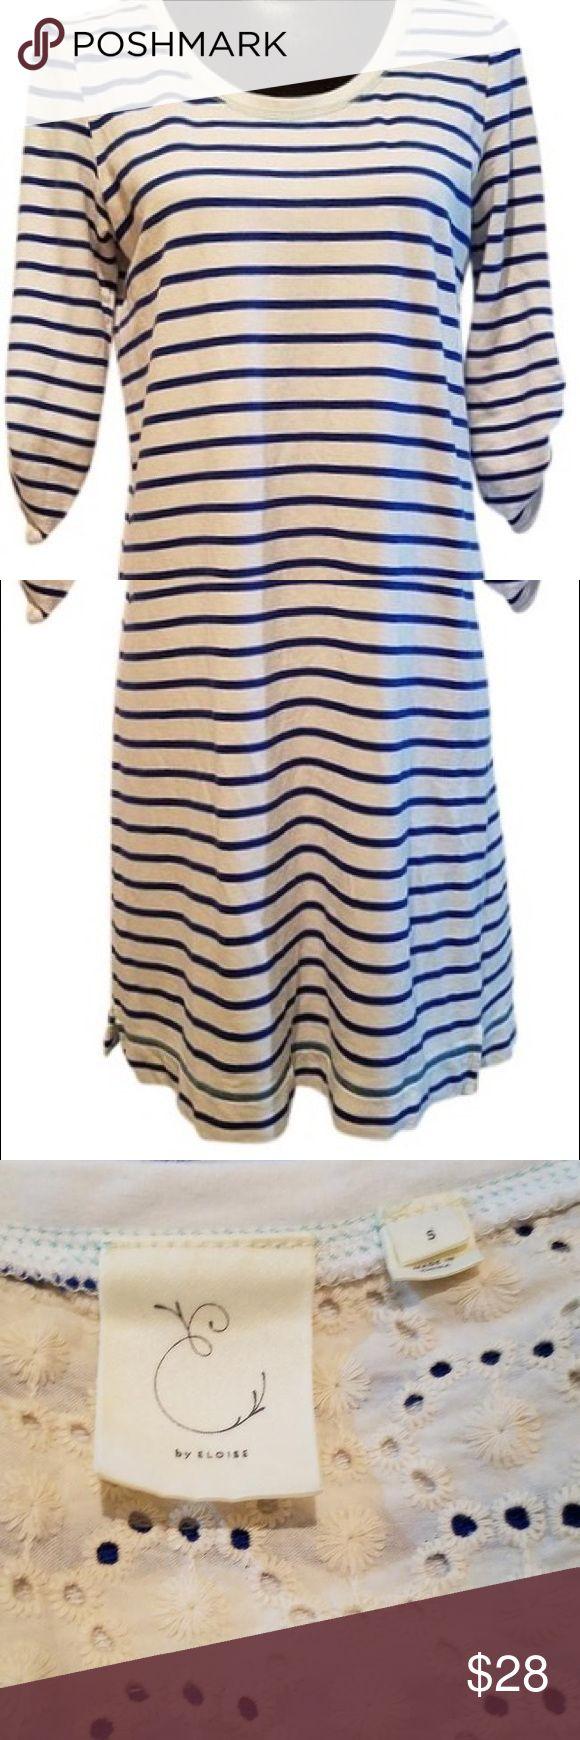 Eloise anthropology dress so cute great shape! Eloise anthropology dress so cute great shape! Anthropologie Dresses Midi